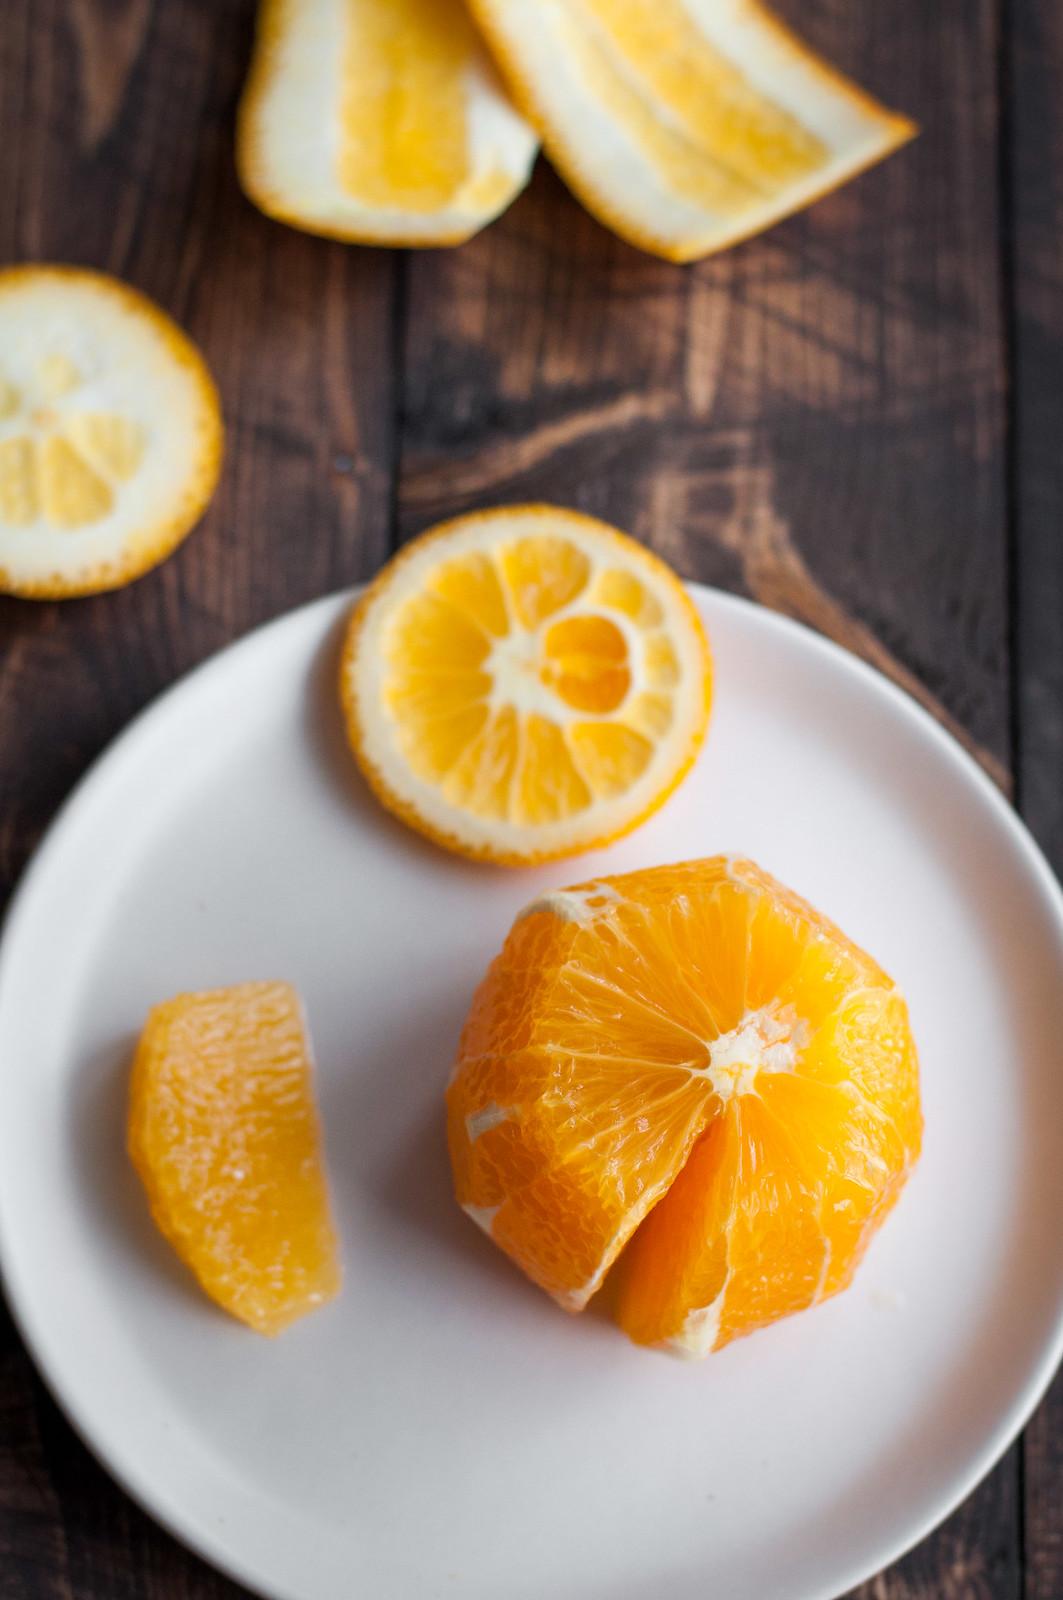 Orange segmenting for arugula salad and toasted sesame vinaigrette